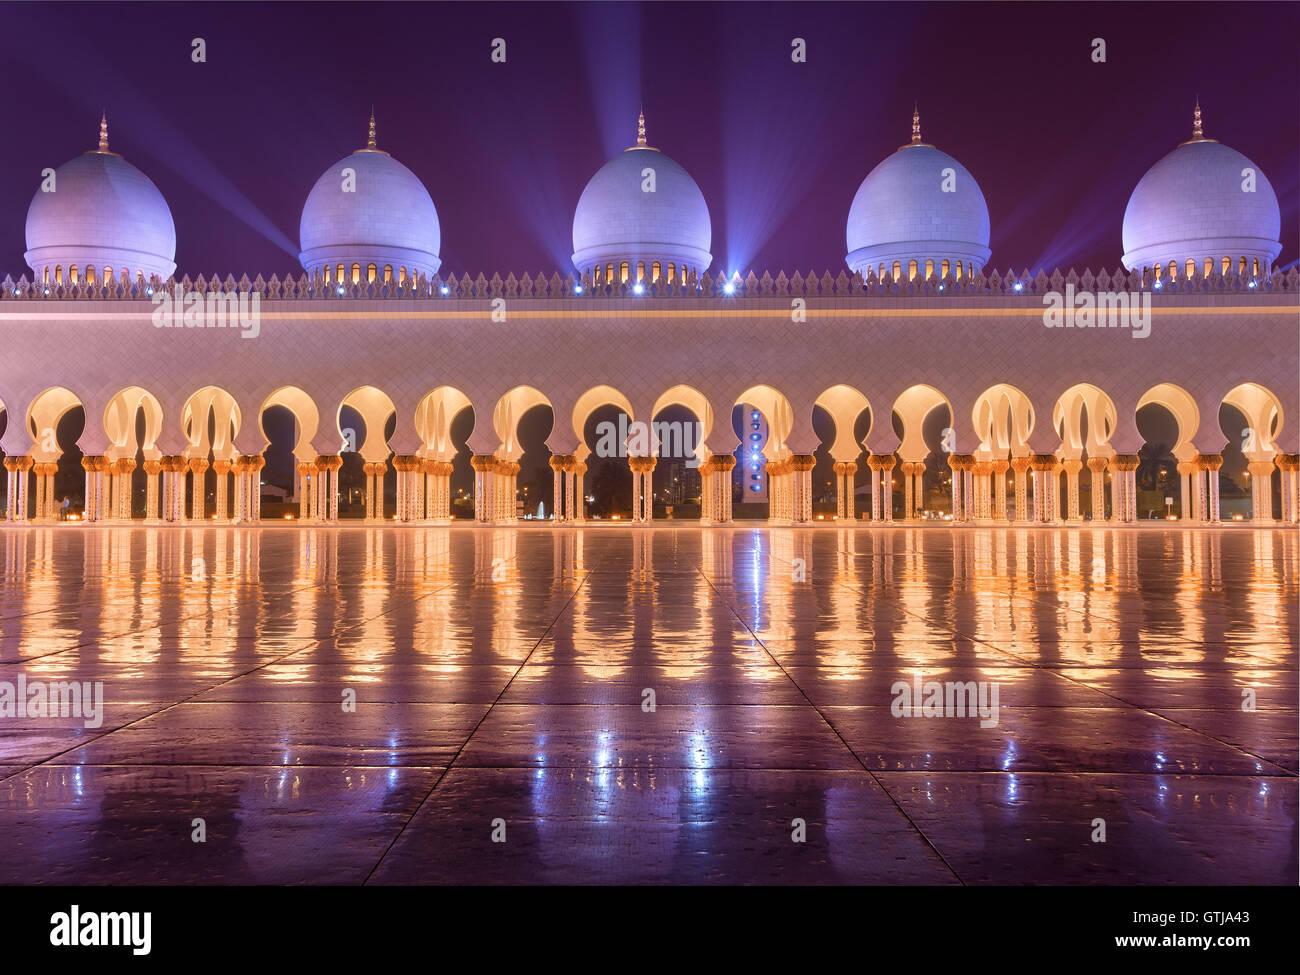 Sheikh Zayed Grand Mosque in Abudhabi sending beautiful light rays - Stock Image